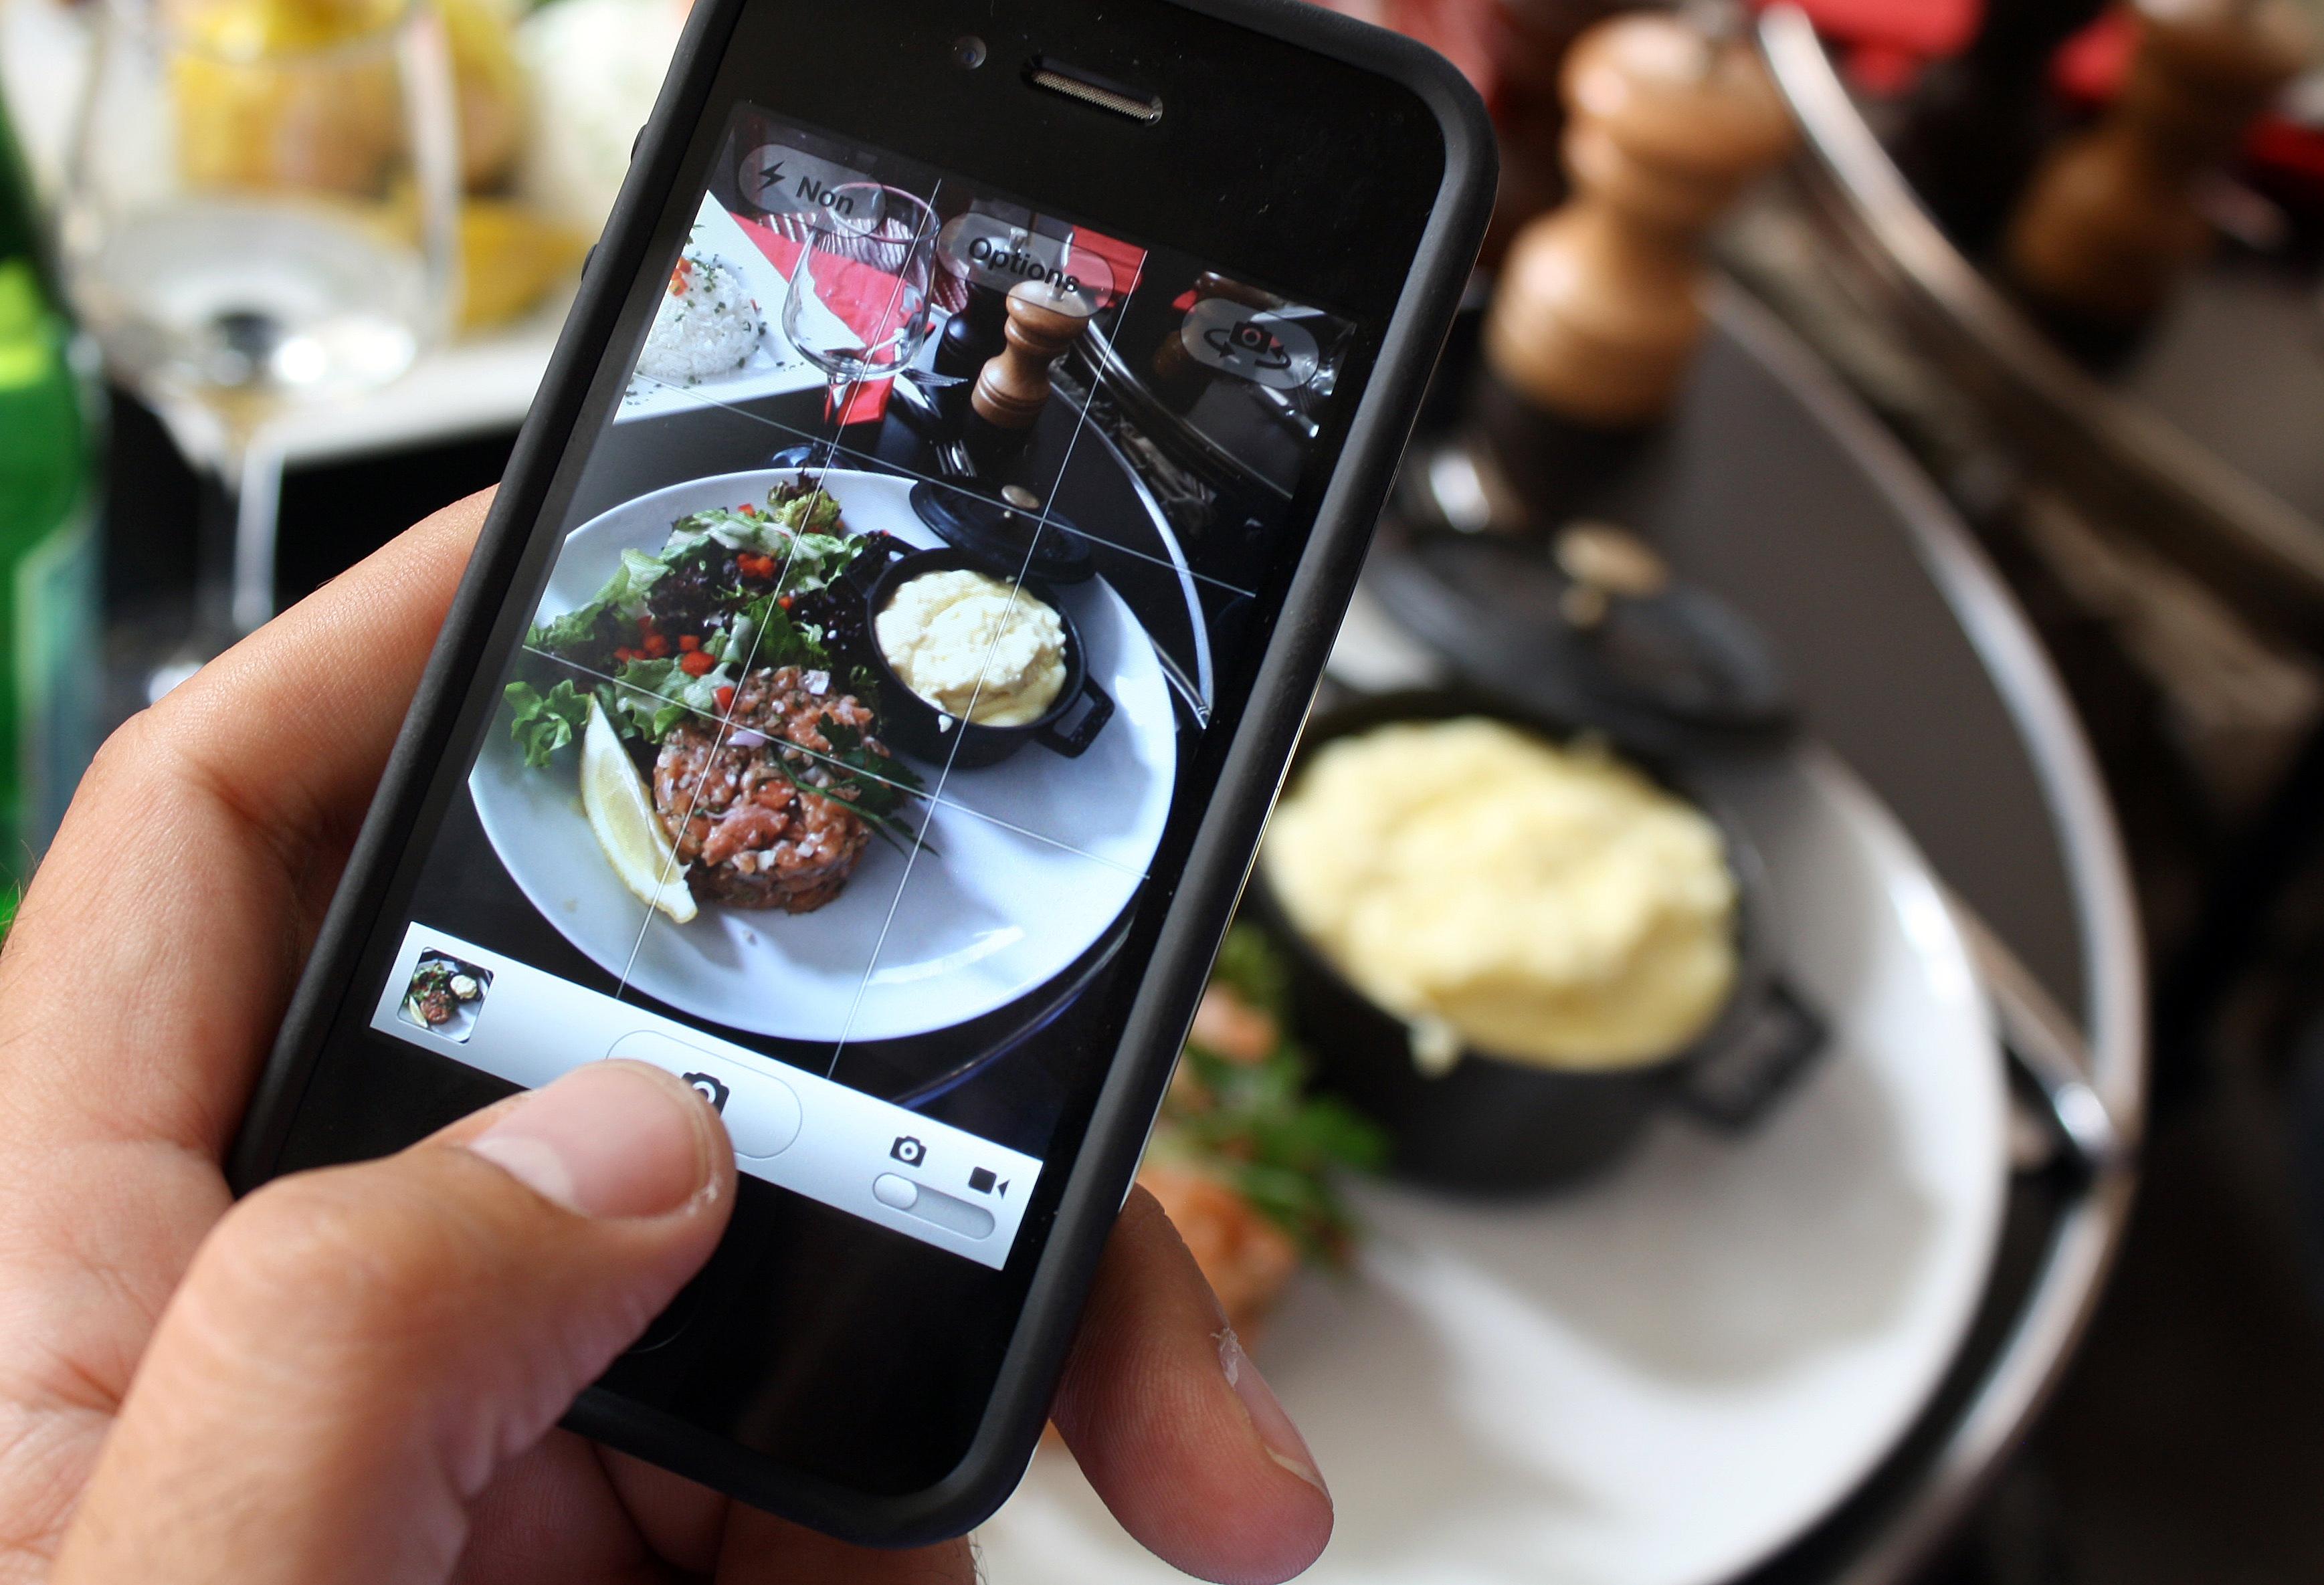 FRANCE-INTERNET-GASTRONOMY-FOOD